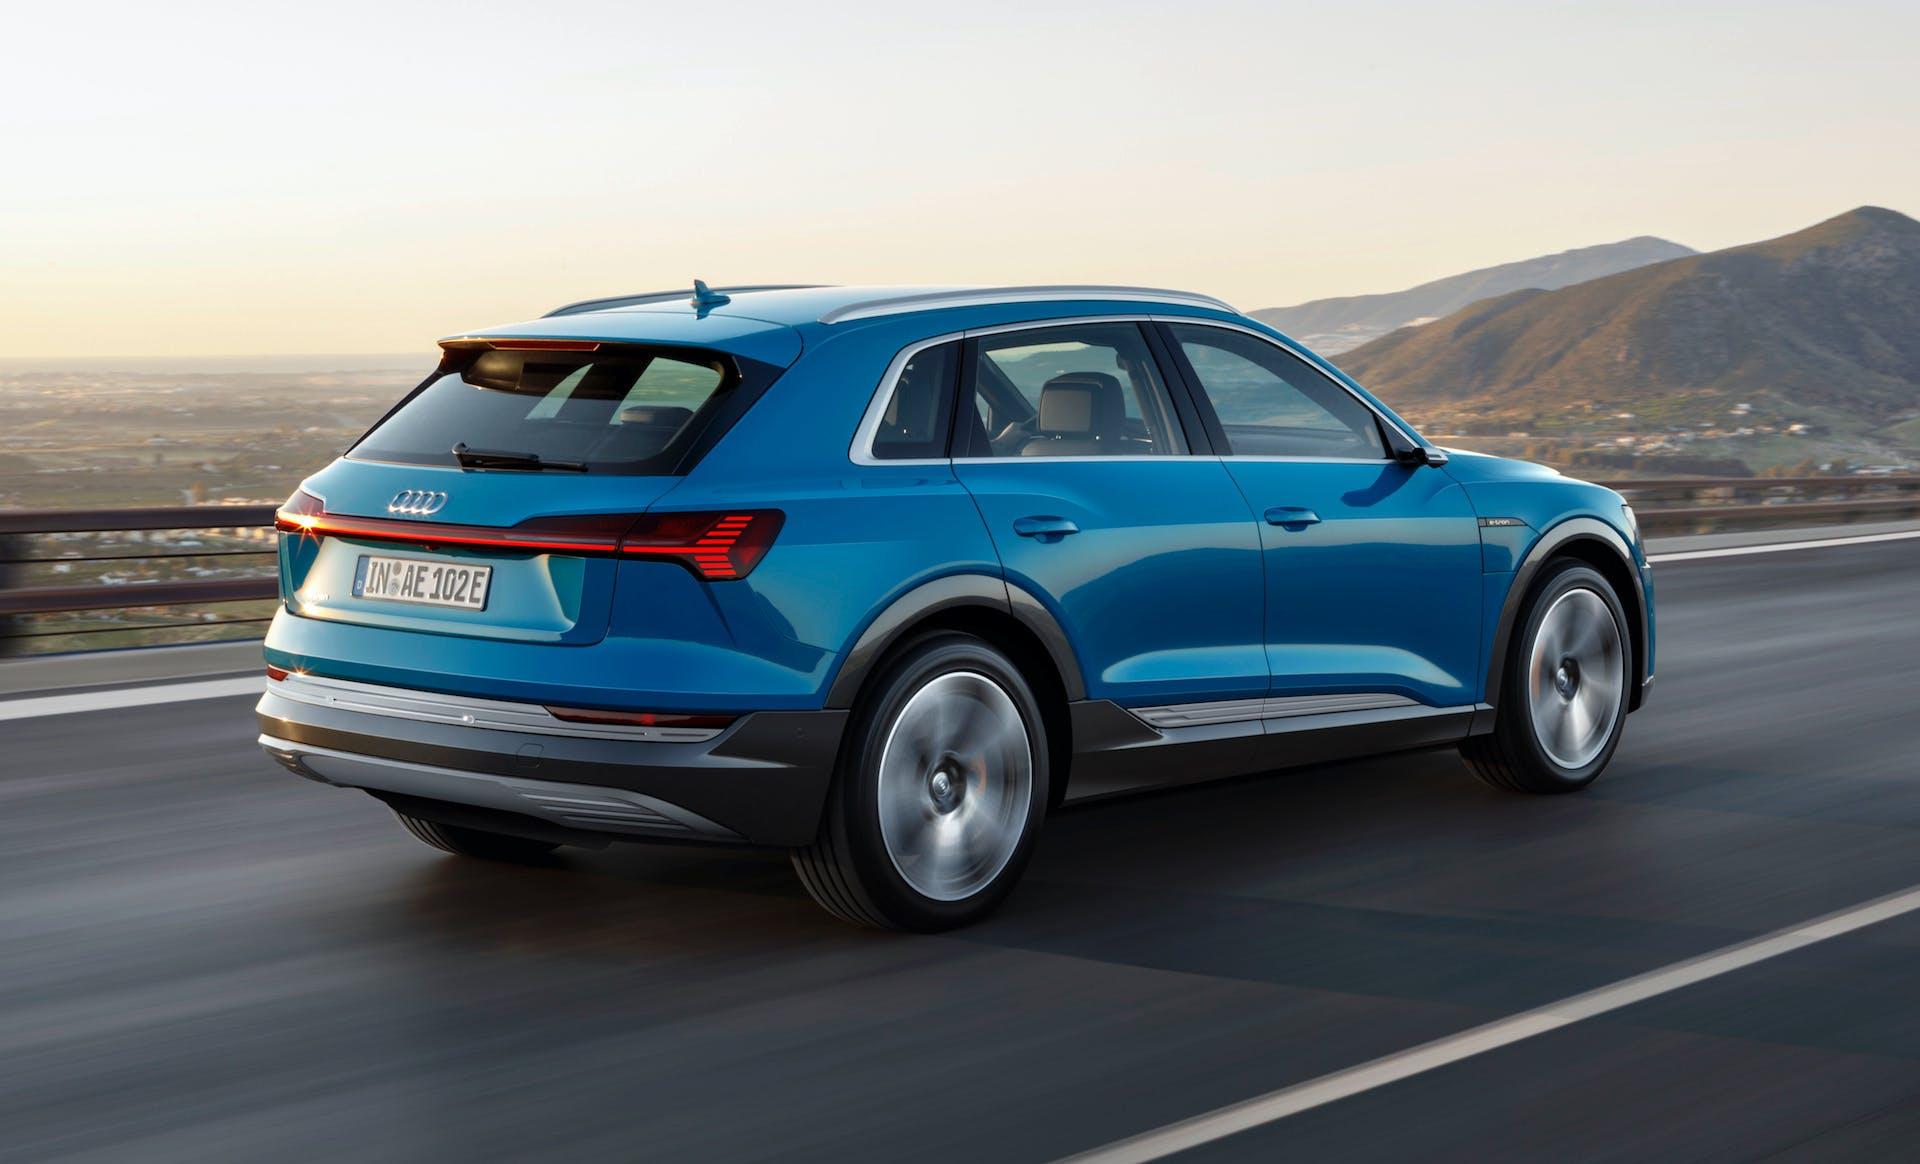 Audi e-tron blu montagne strada